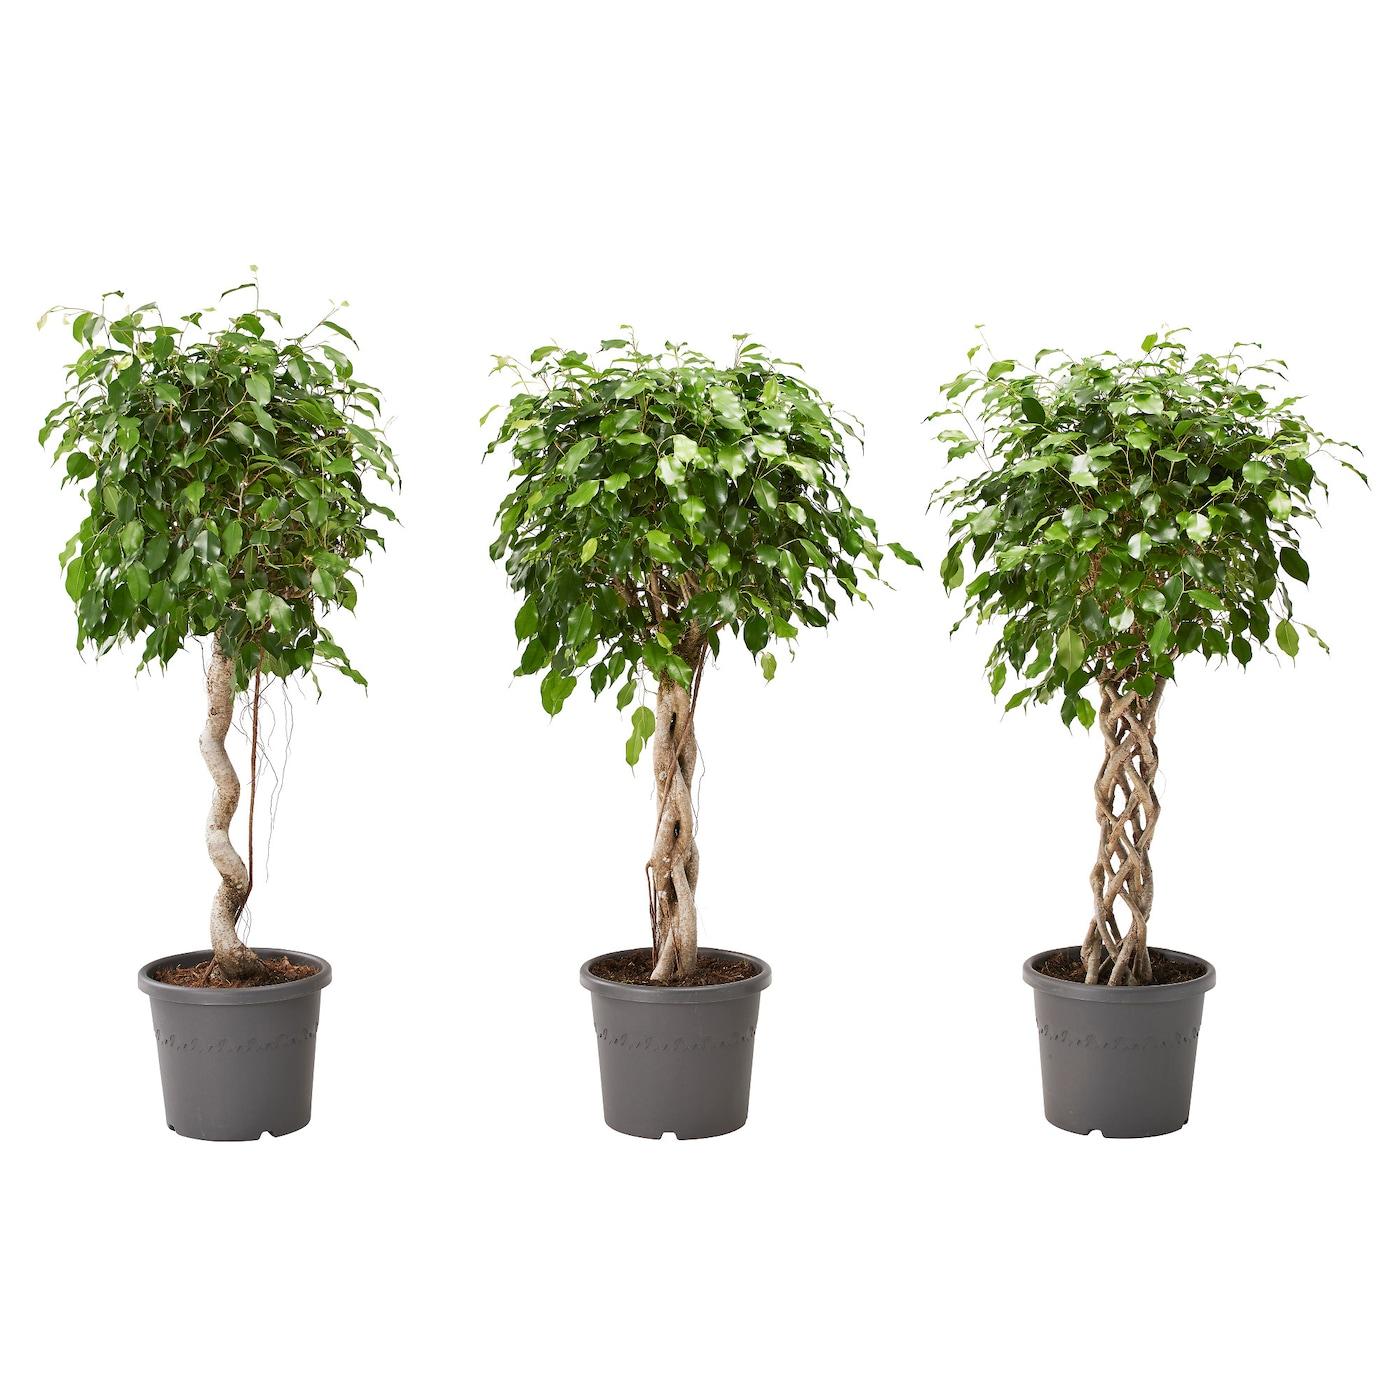 Plantas Ornamentais - Etapa 2 13